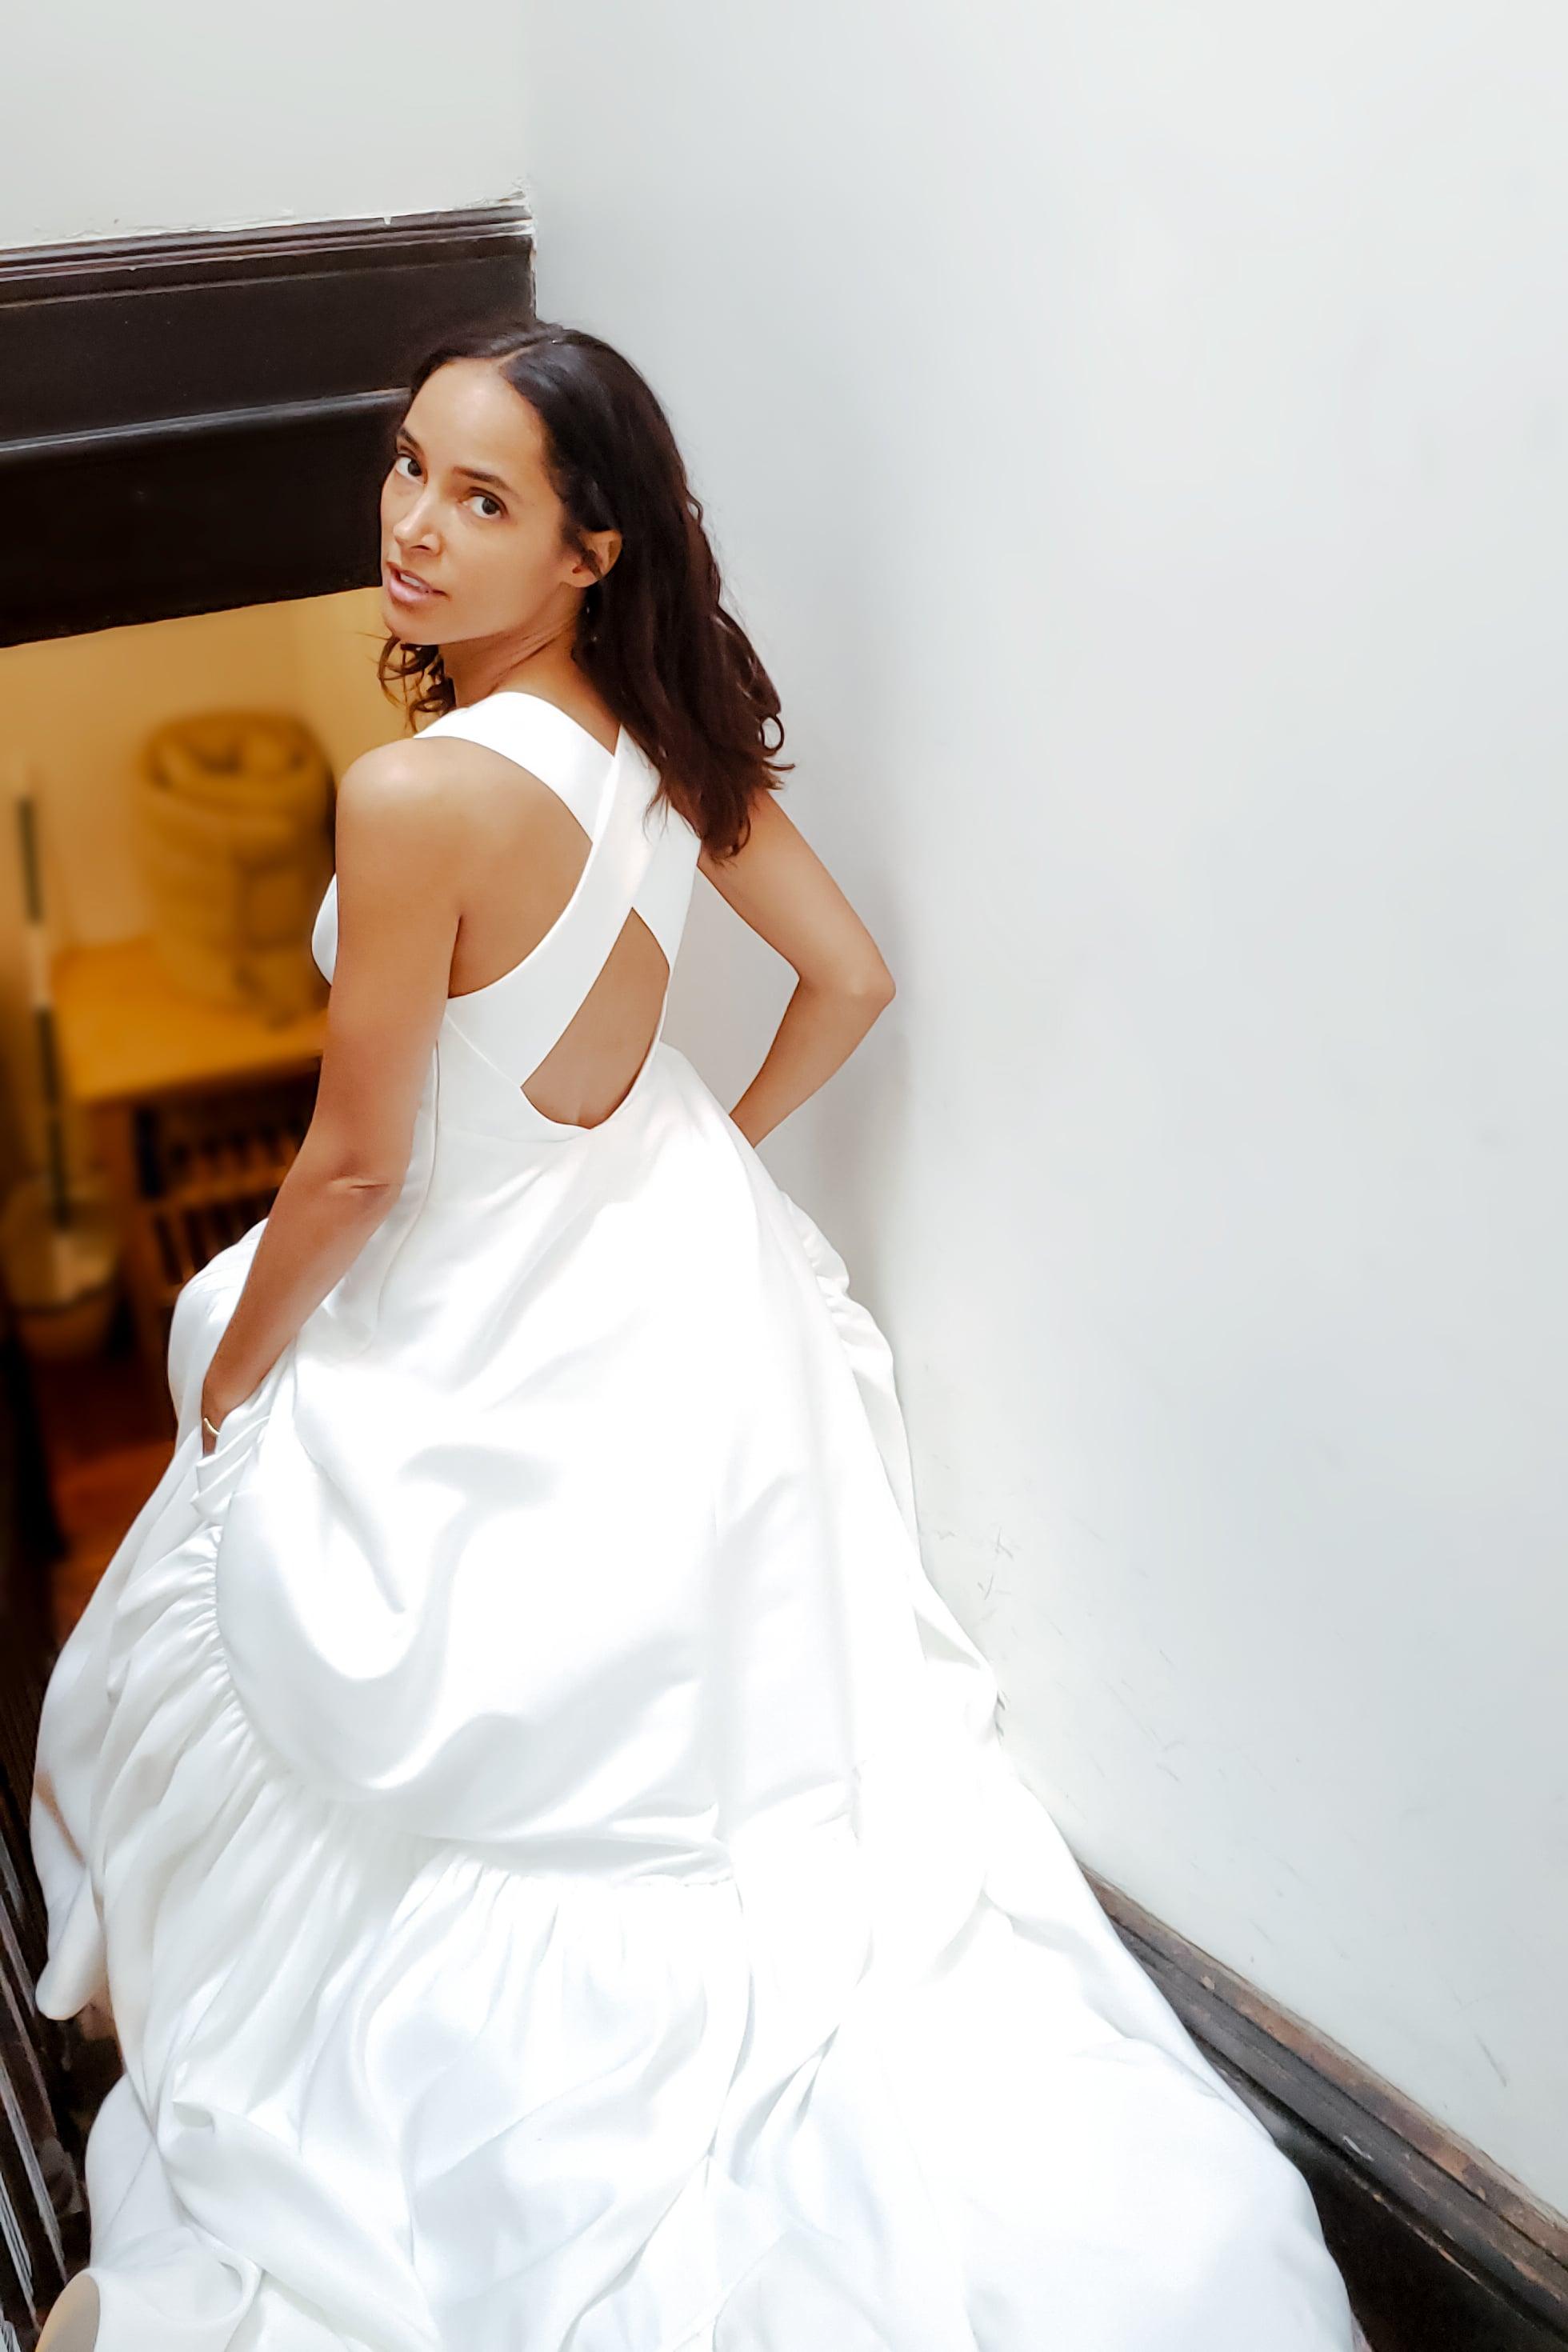 Best Wedding Dresses For Spring 2021 Brides Popsugar Fashion,Wedding Party Wear Dresses For Teenage Girls